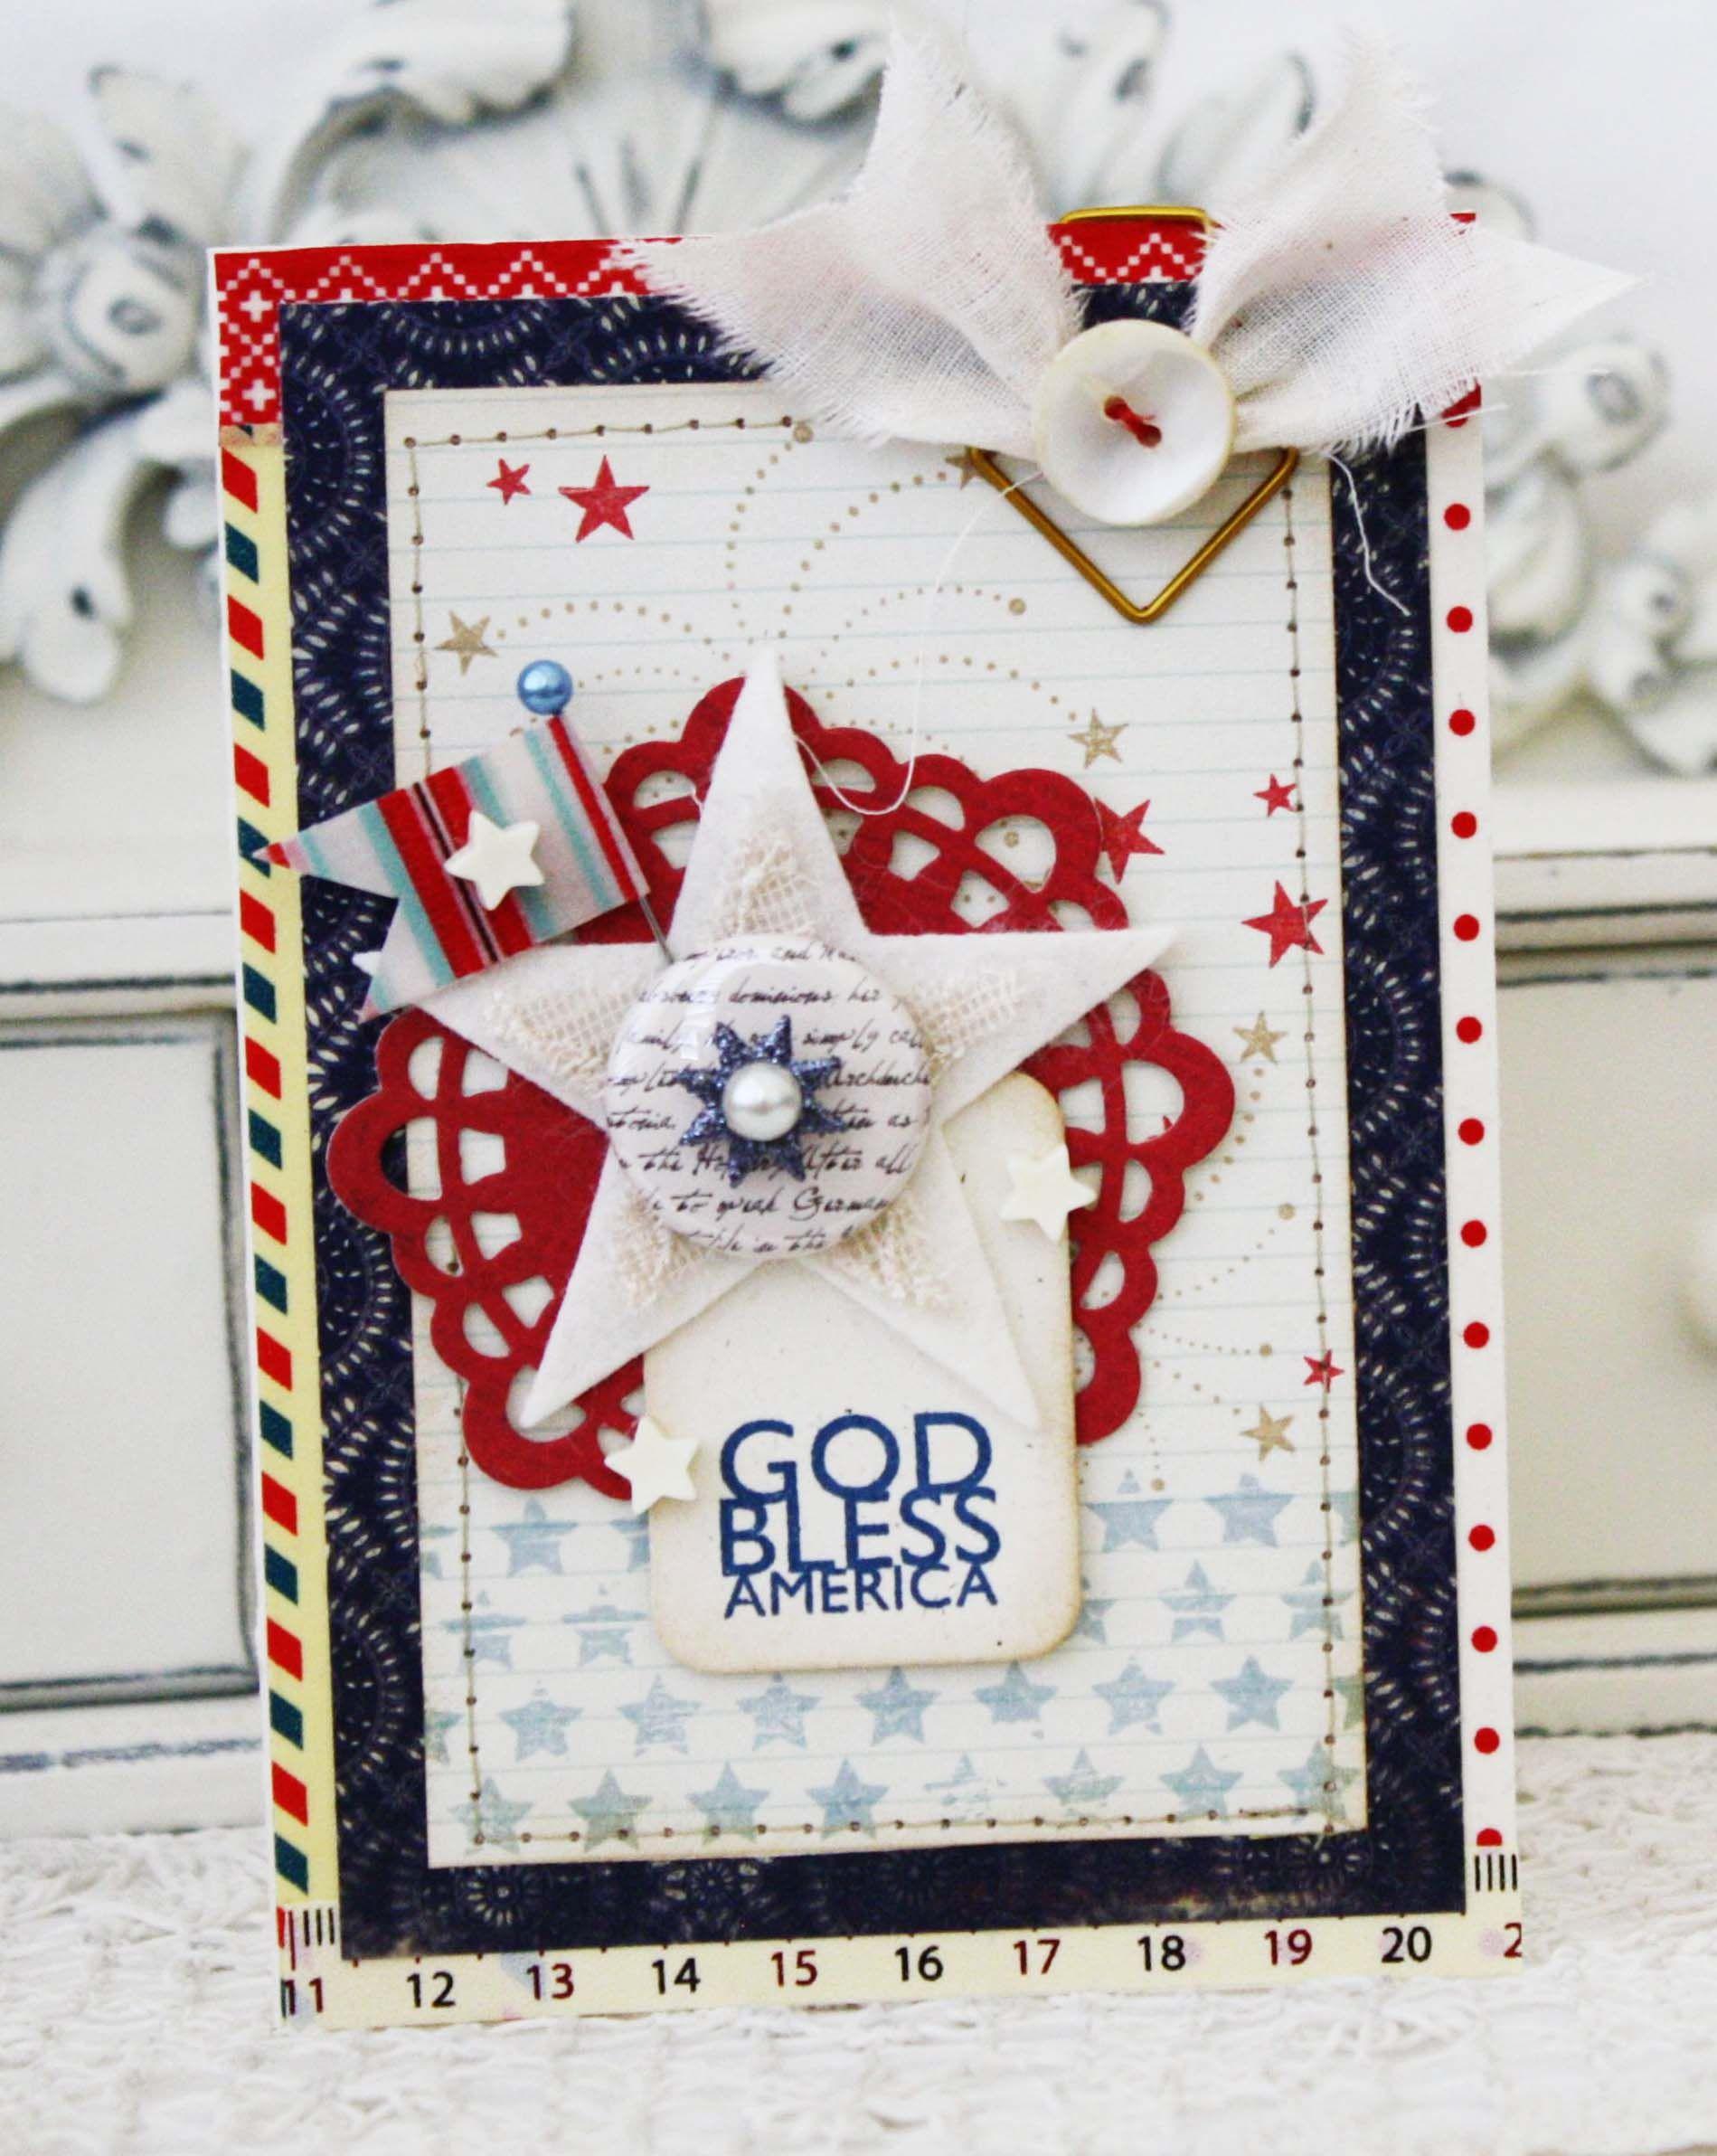 God Bless America Cards Handmade Beautiful Handmade Cards Paper Crafts Cards